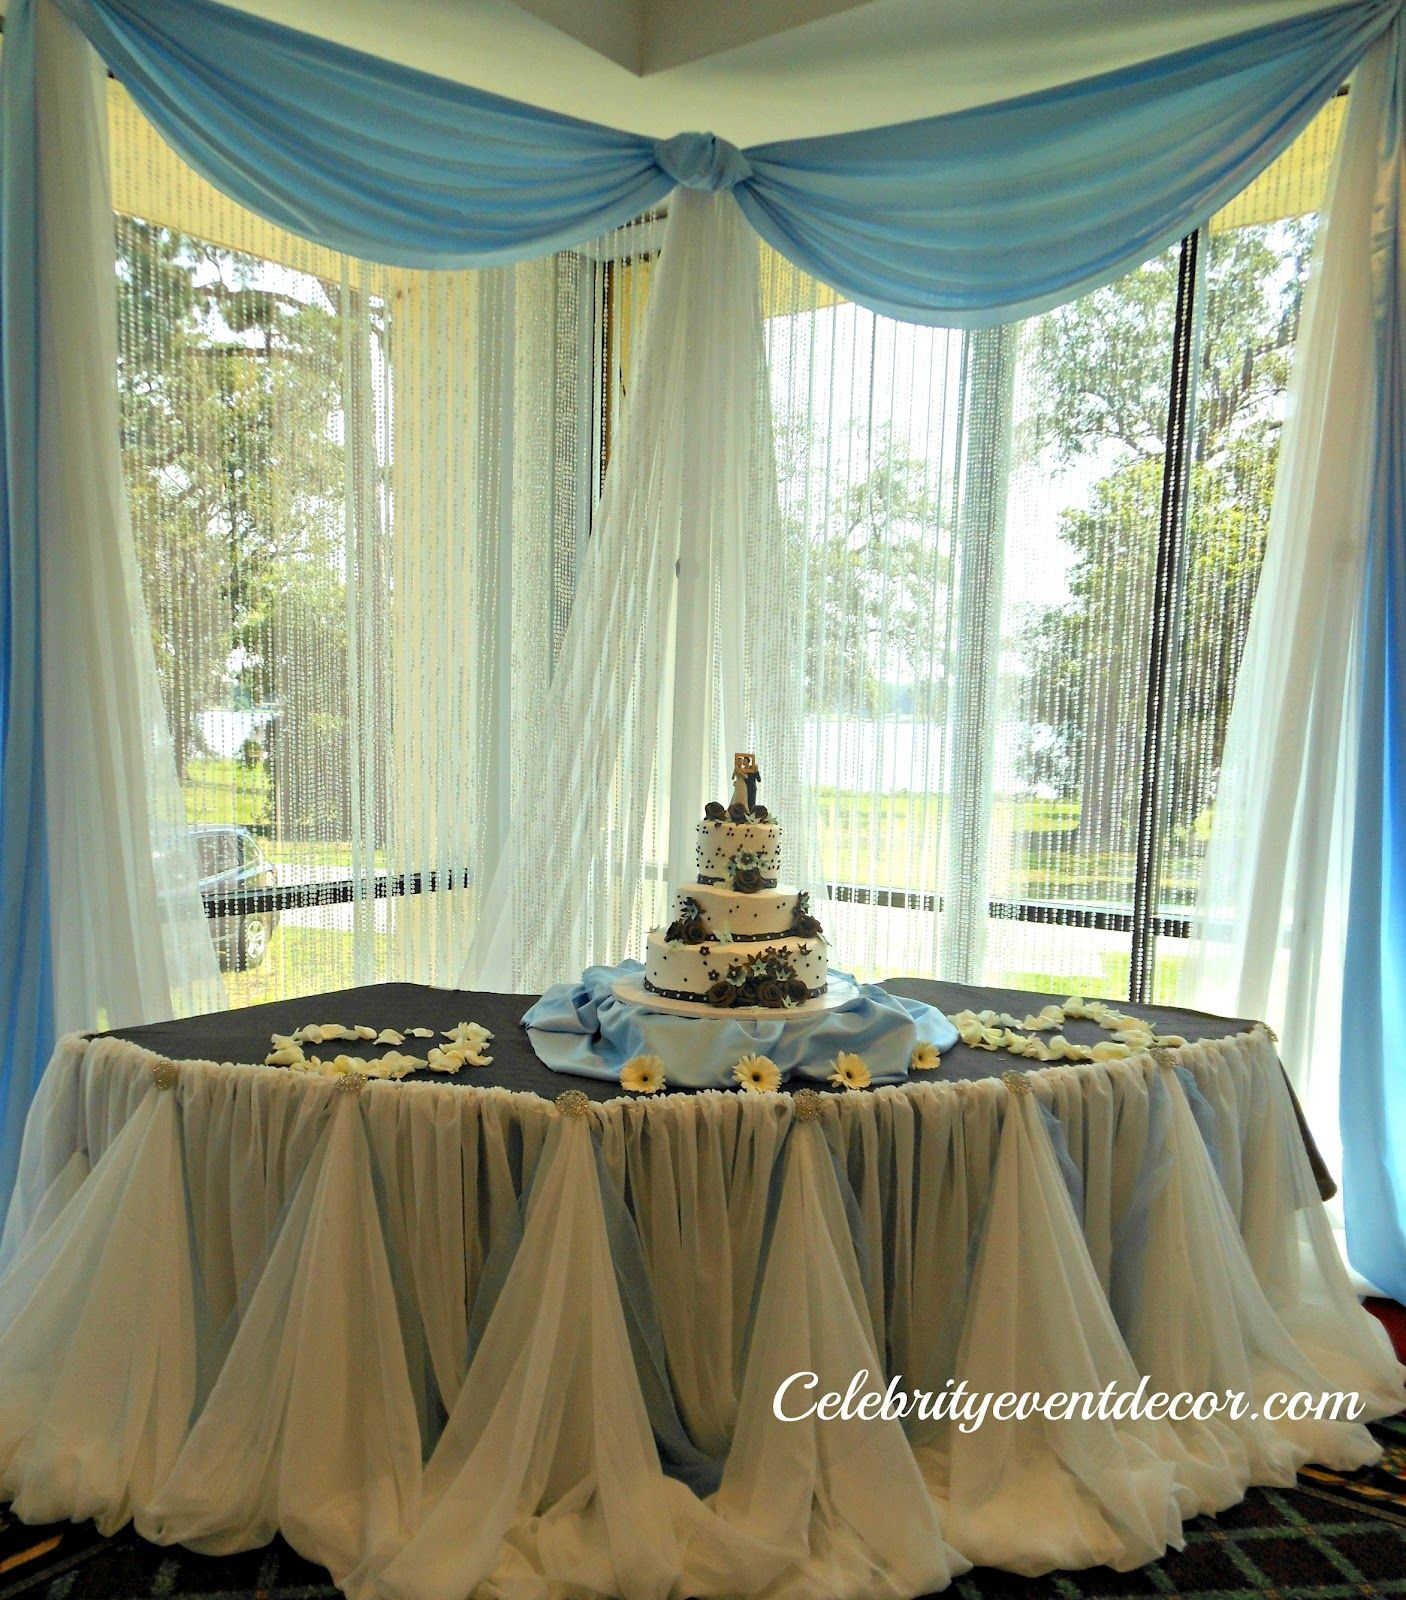 Wedding Cake Tables Decorating Ideas: Decorating Cake Table Ideas